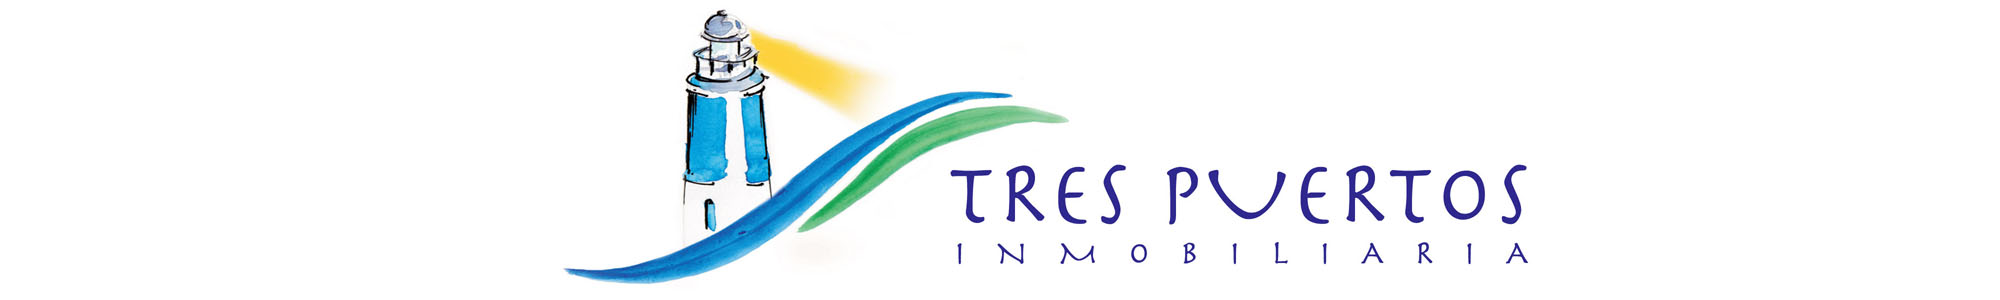 Inmobiliaria Tres Puertos Ltda